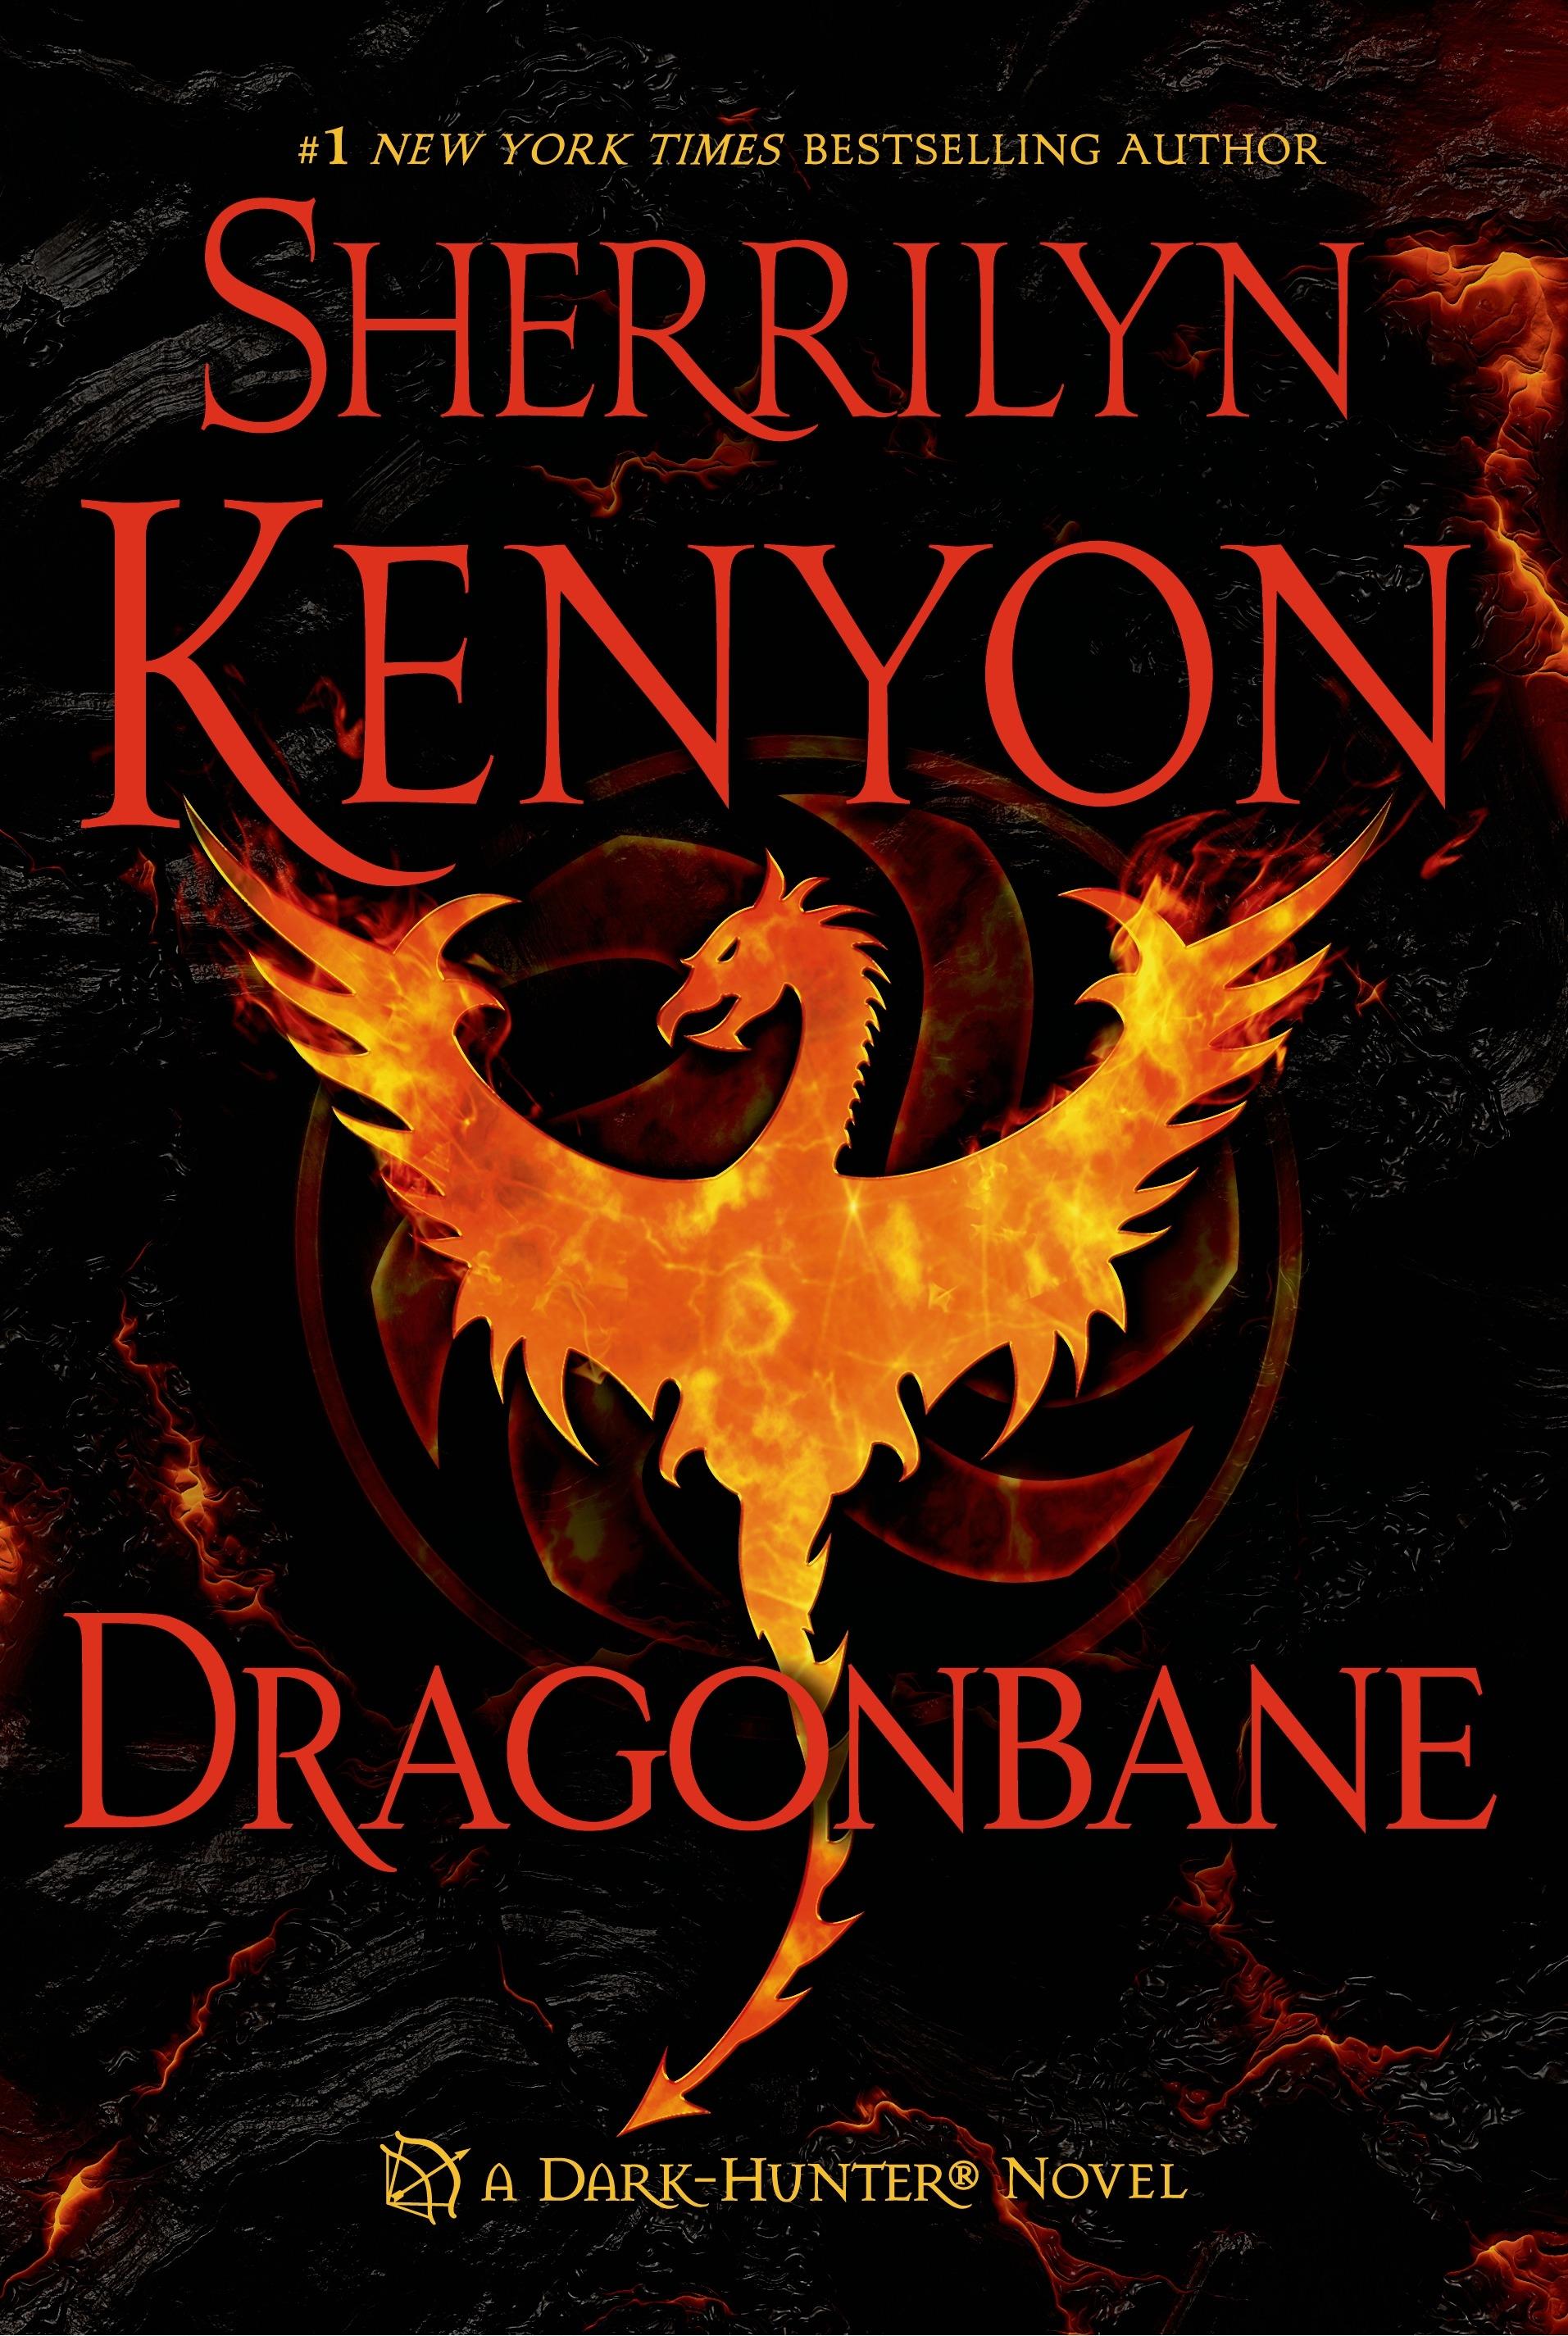 Dragonbane : a Dark-Hunter novel